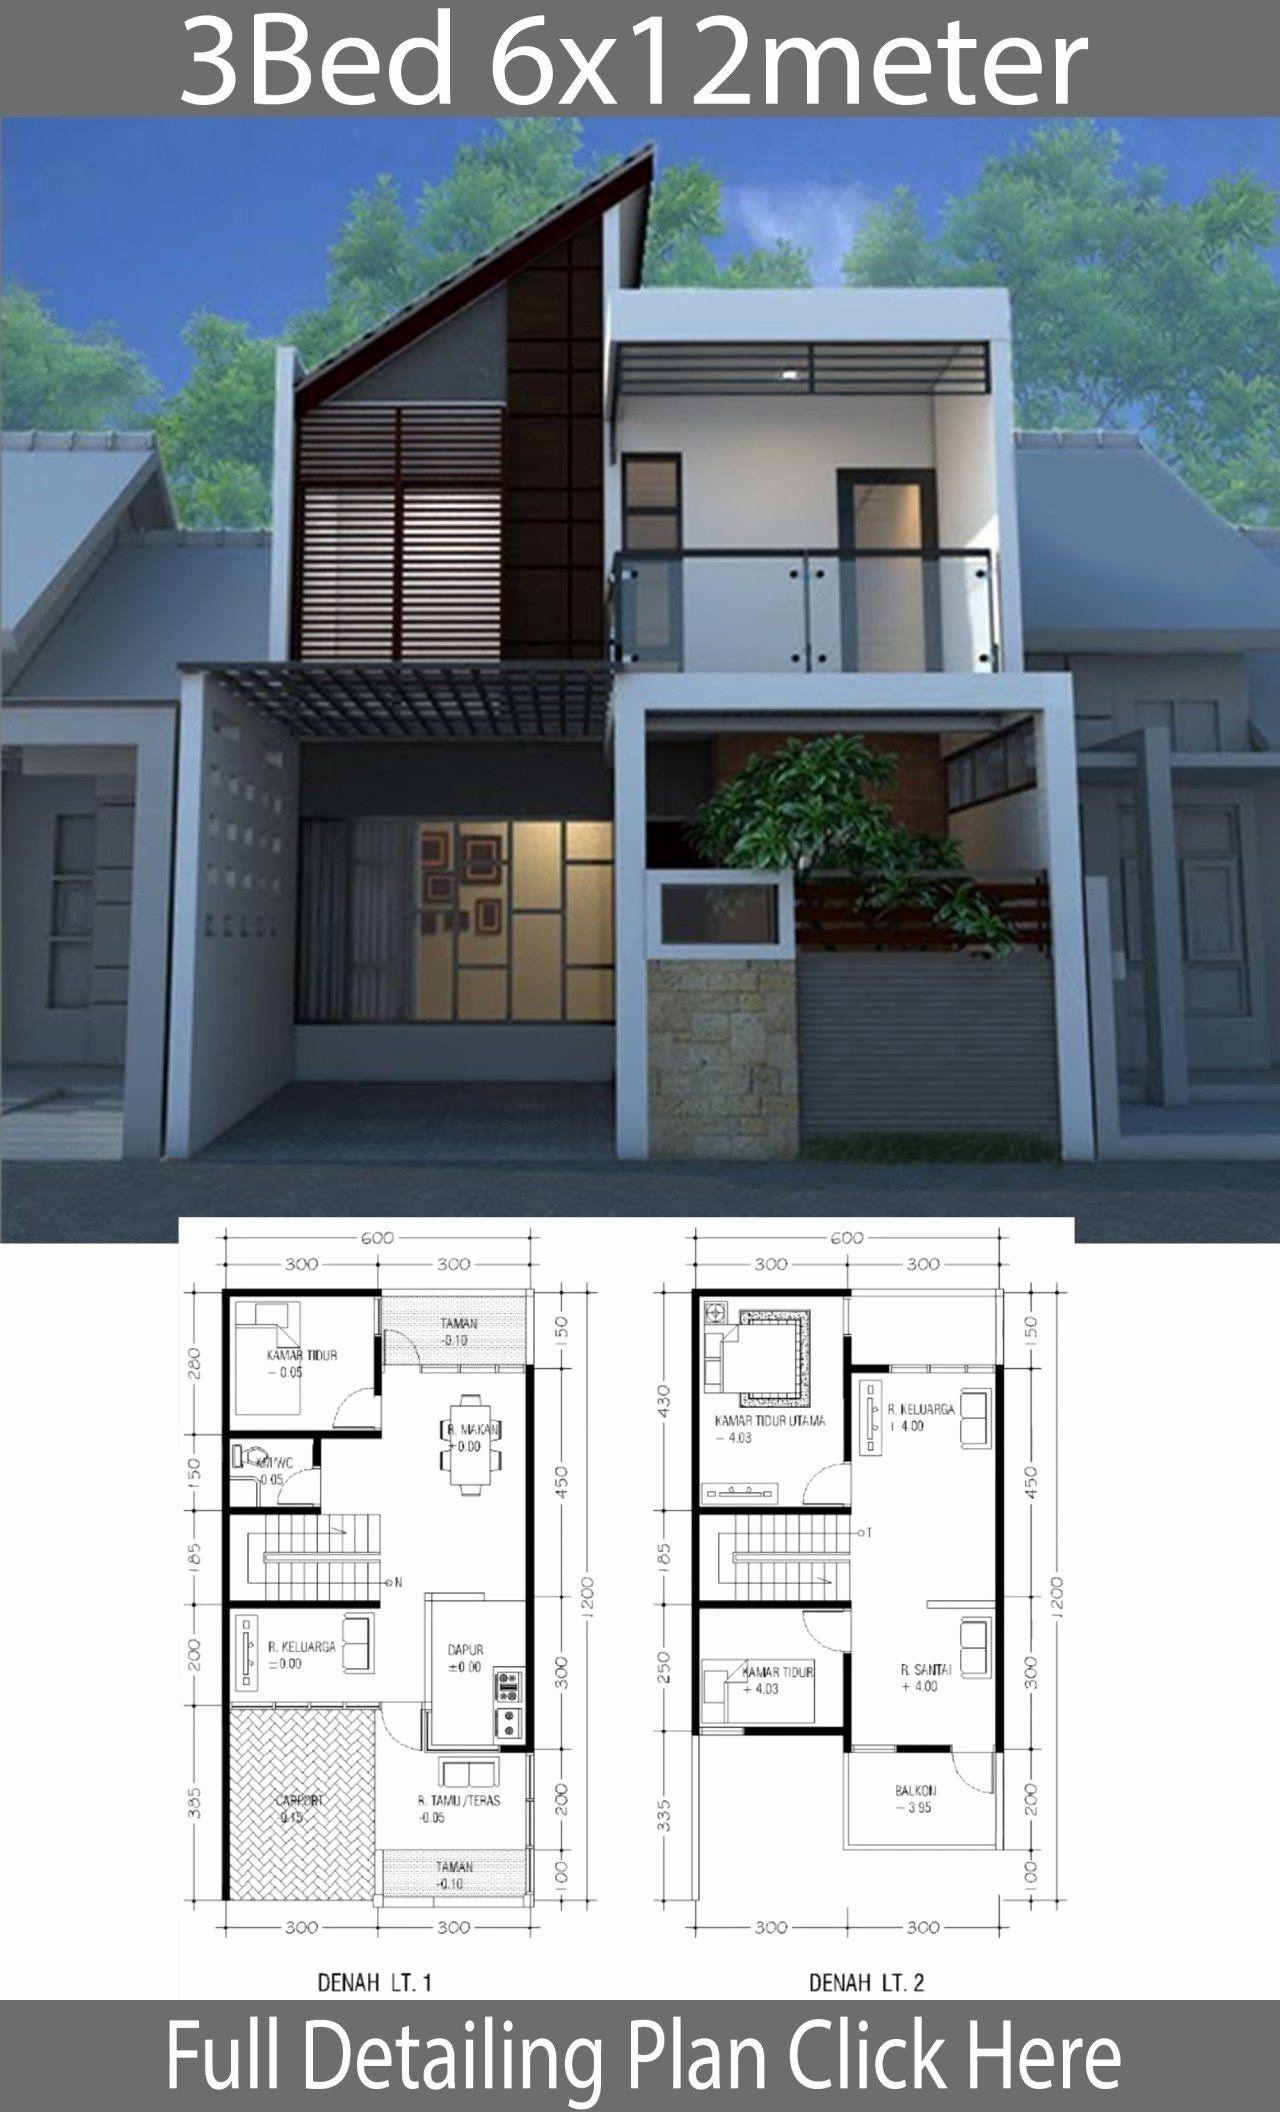 150 000 House Plans Inspirational Minimalist Home Design On Land Of 6m X 12m Rumah Beton Arsitektur Rumah Desain Rumah 2 Lantai